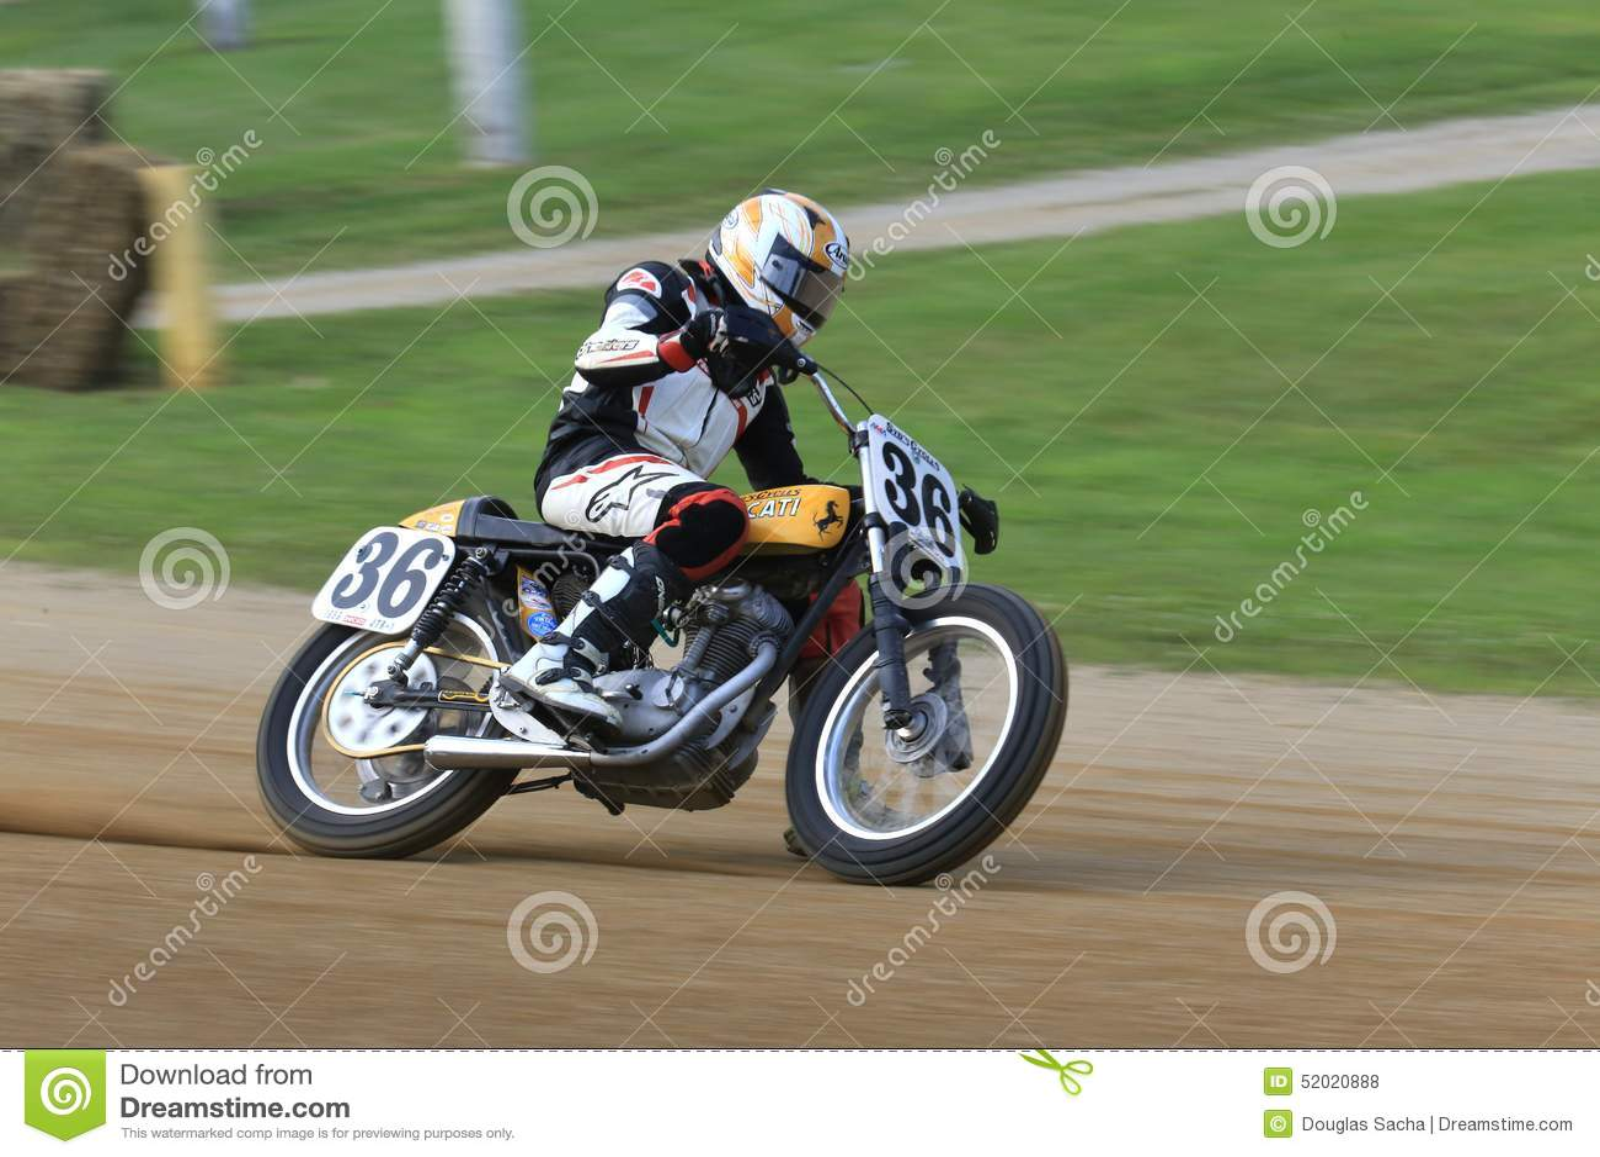 Vintage Ducati Bike Editorial Stock Photo Image Of Oval